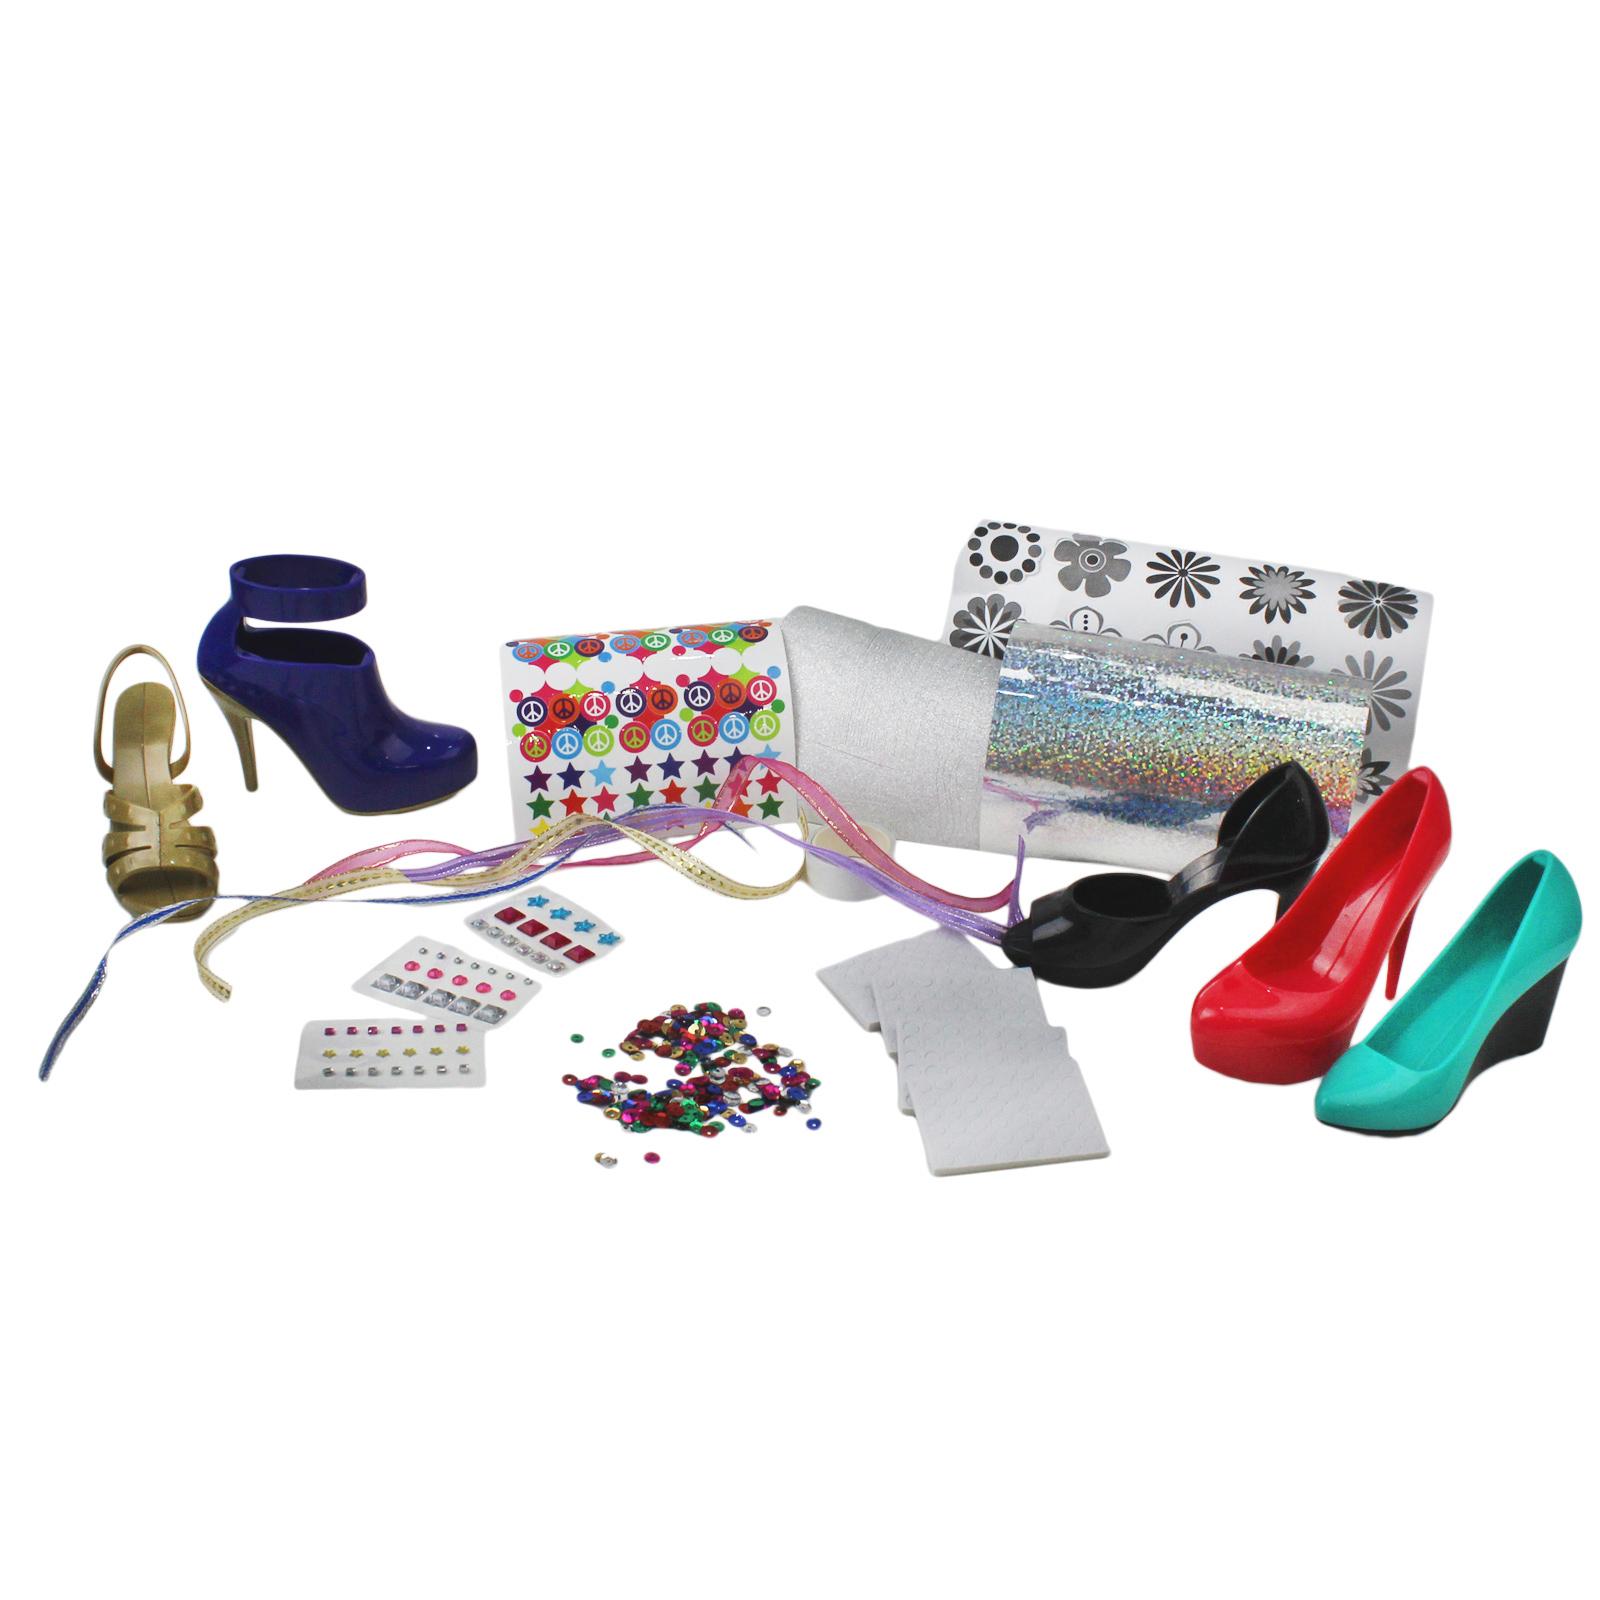 Girls Shoe Design Play Set Crayola Hot Heels Kids Fashion Sticker Art Kit 5 Pack Ebay